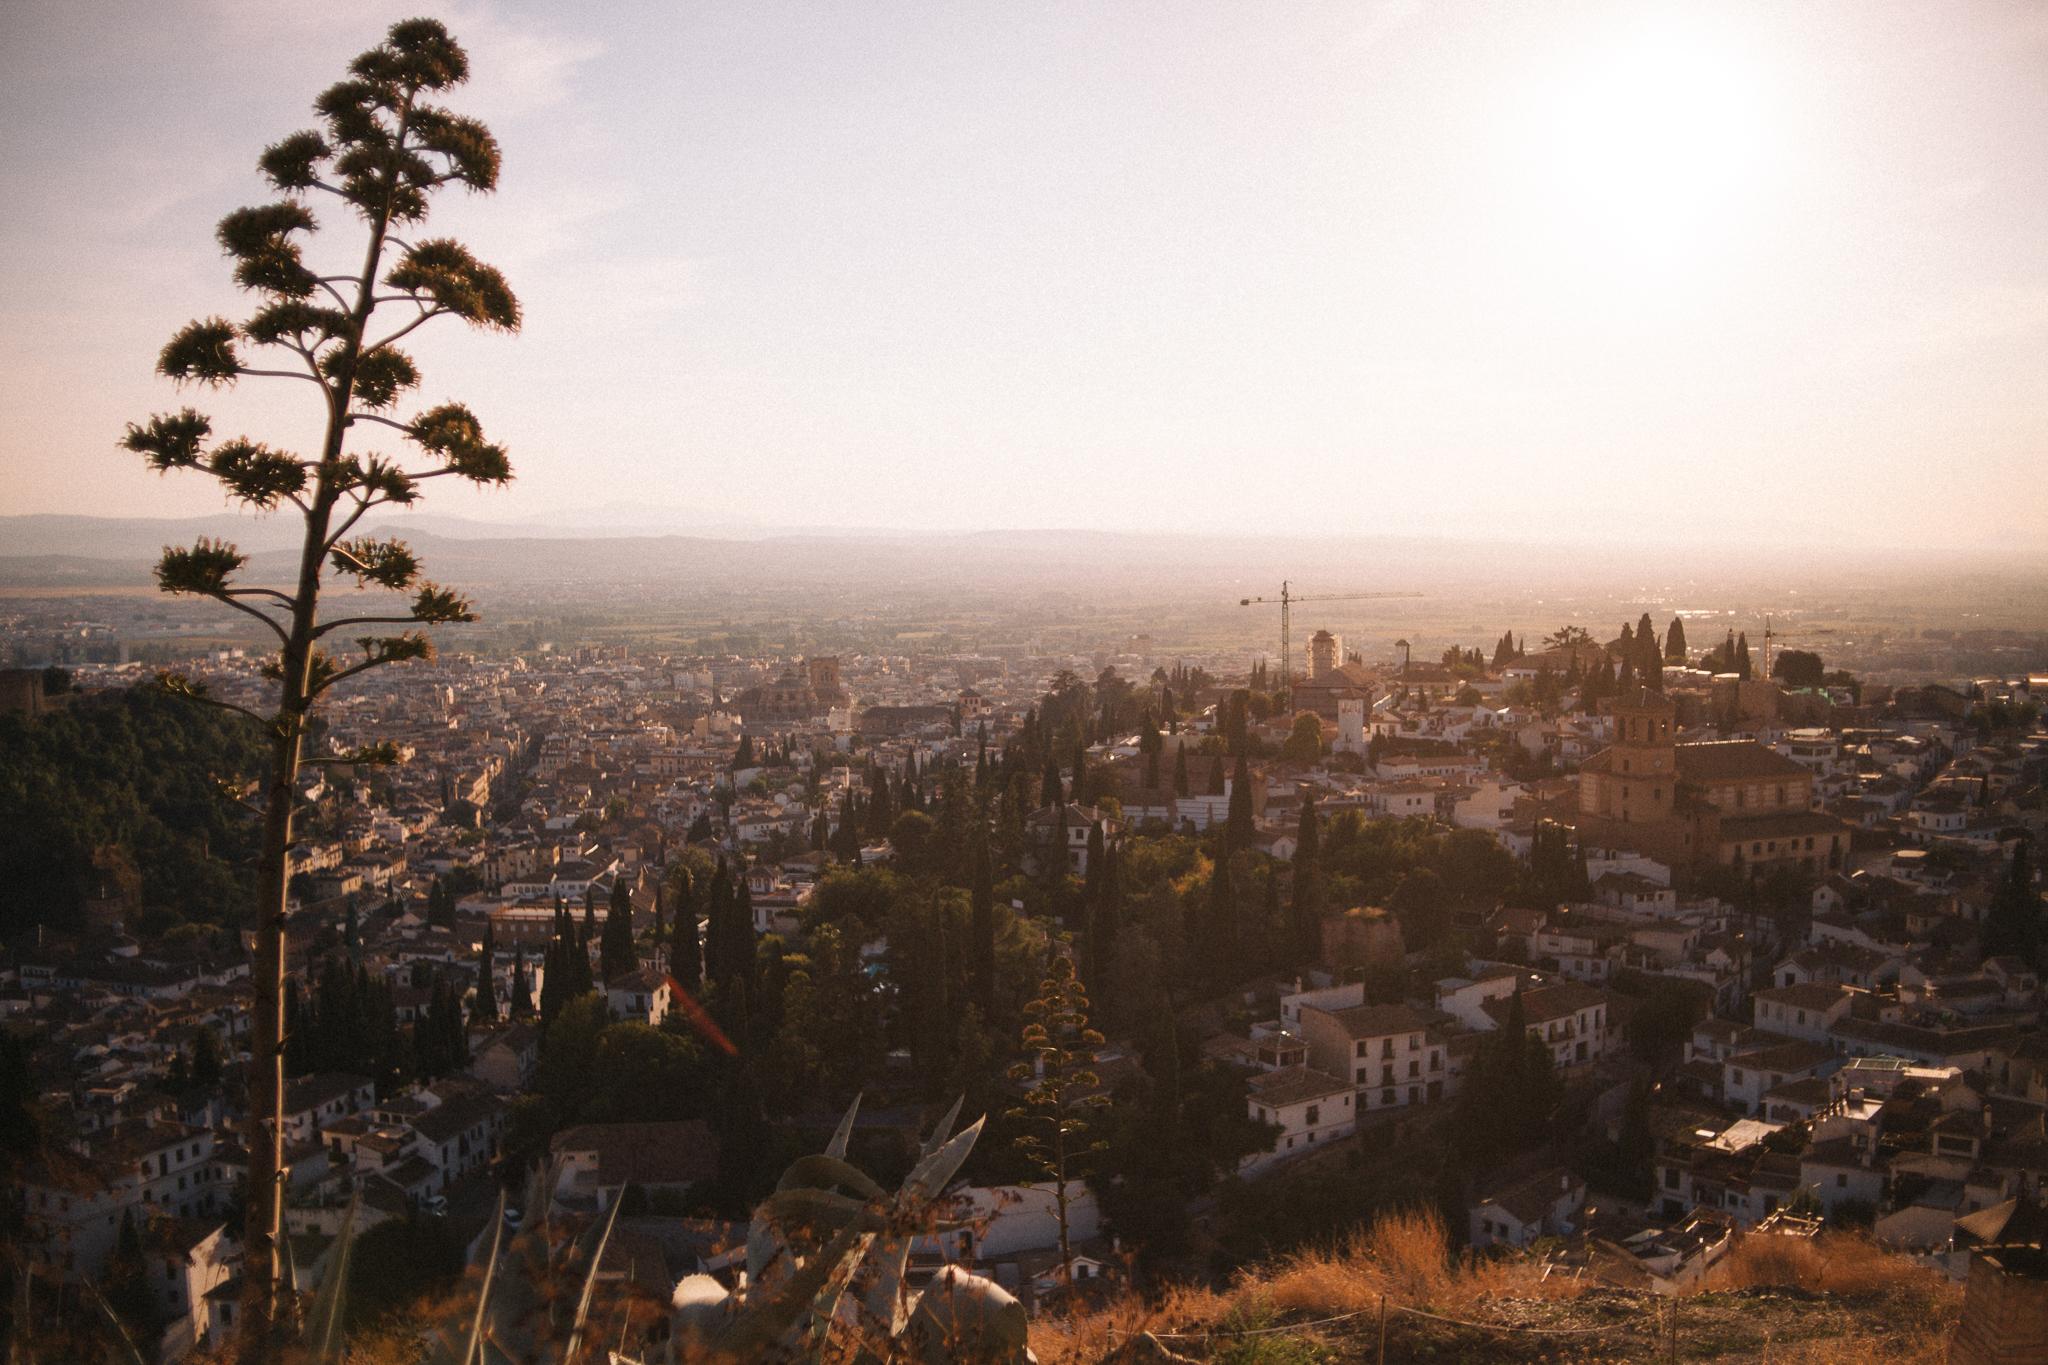 Granada, my favorite city!